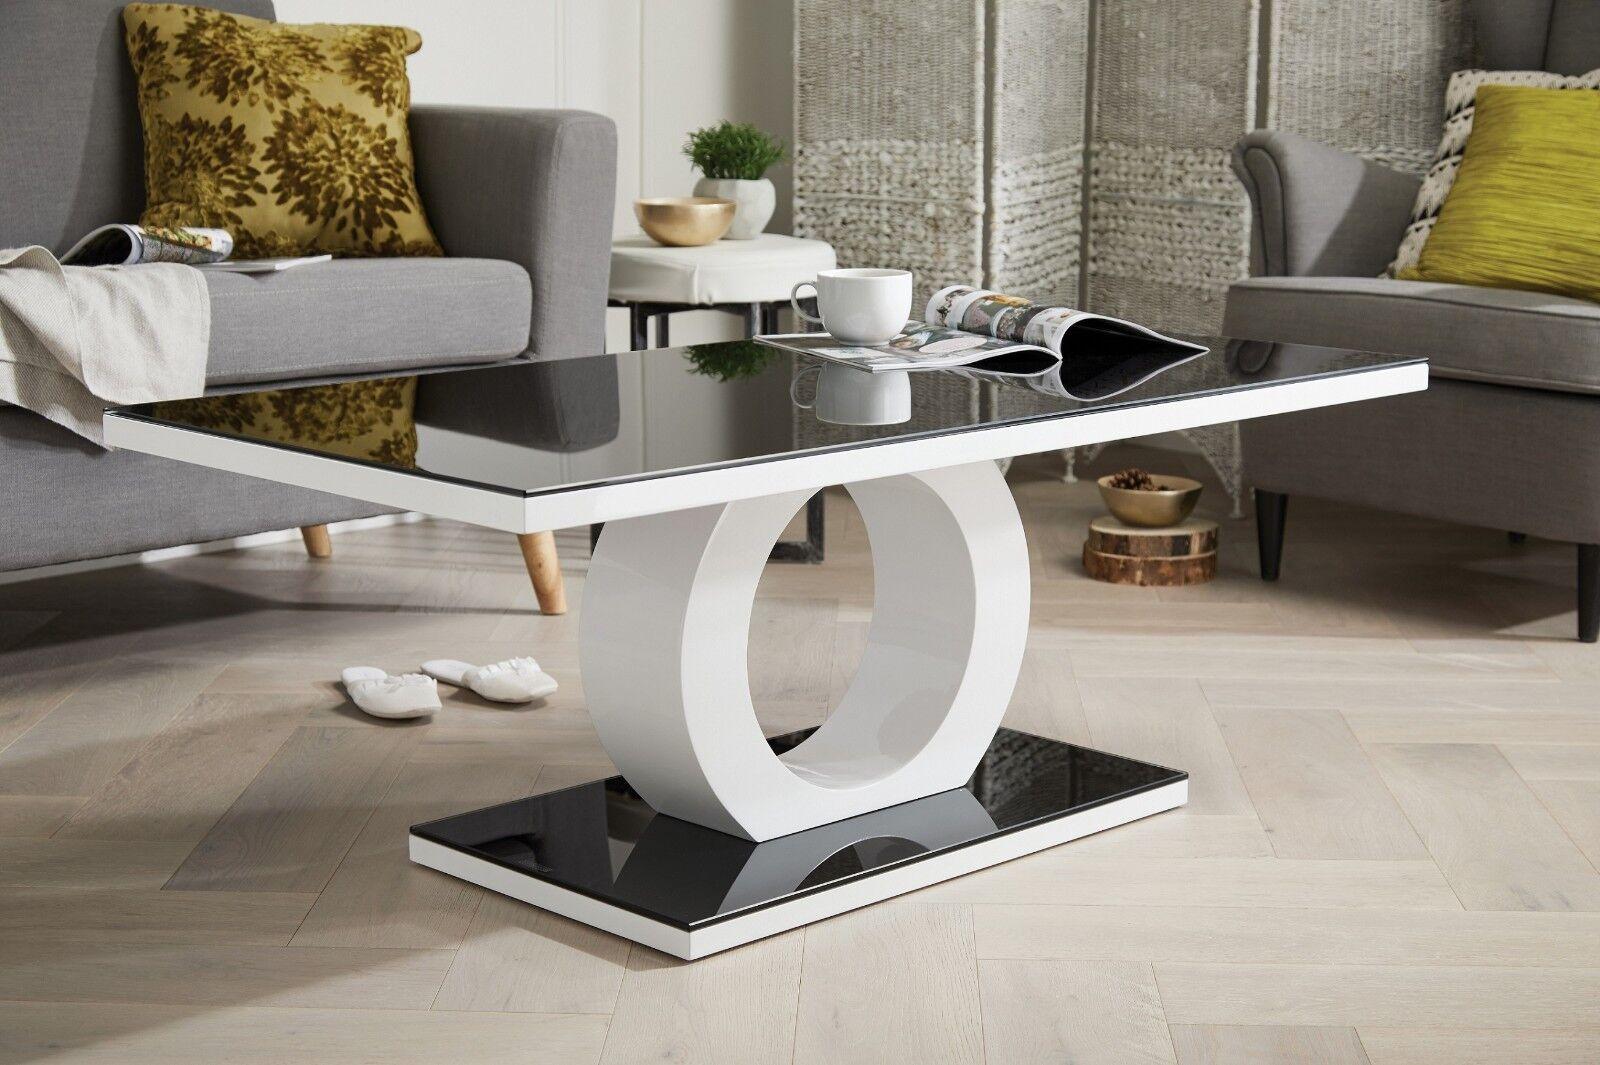 Giovani Designer Halo Black White High Gloss Glass Coffee Table Modern Furniture